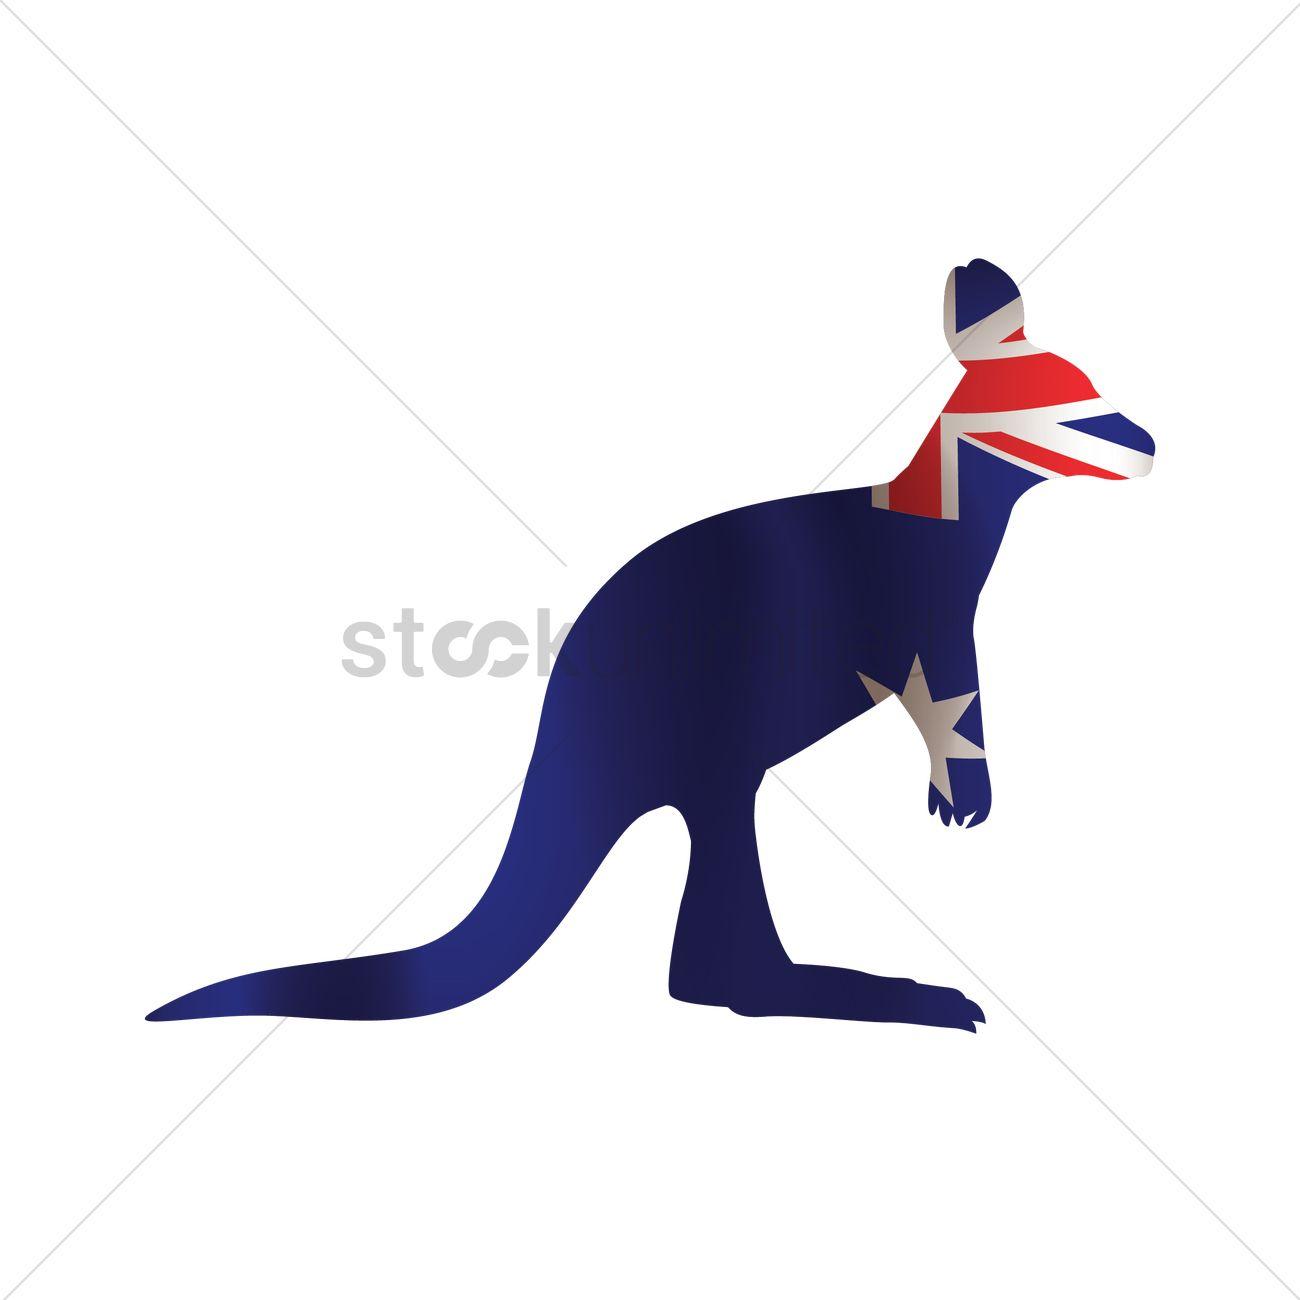 Australian kangaroo clipart vector royalty free stock Australia flag on kangaroo shaped icon Vector Image - 1962187 ... vector royalty free stock